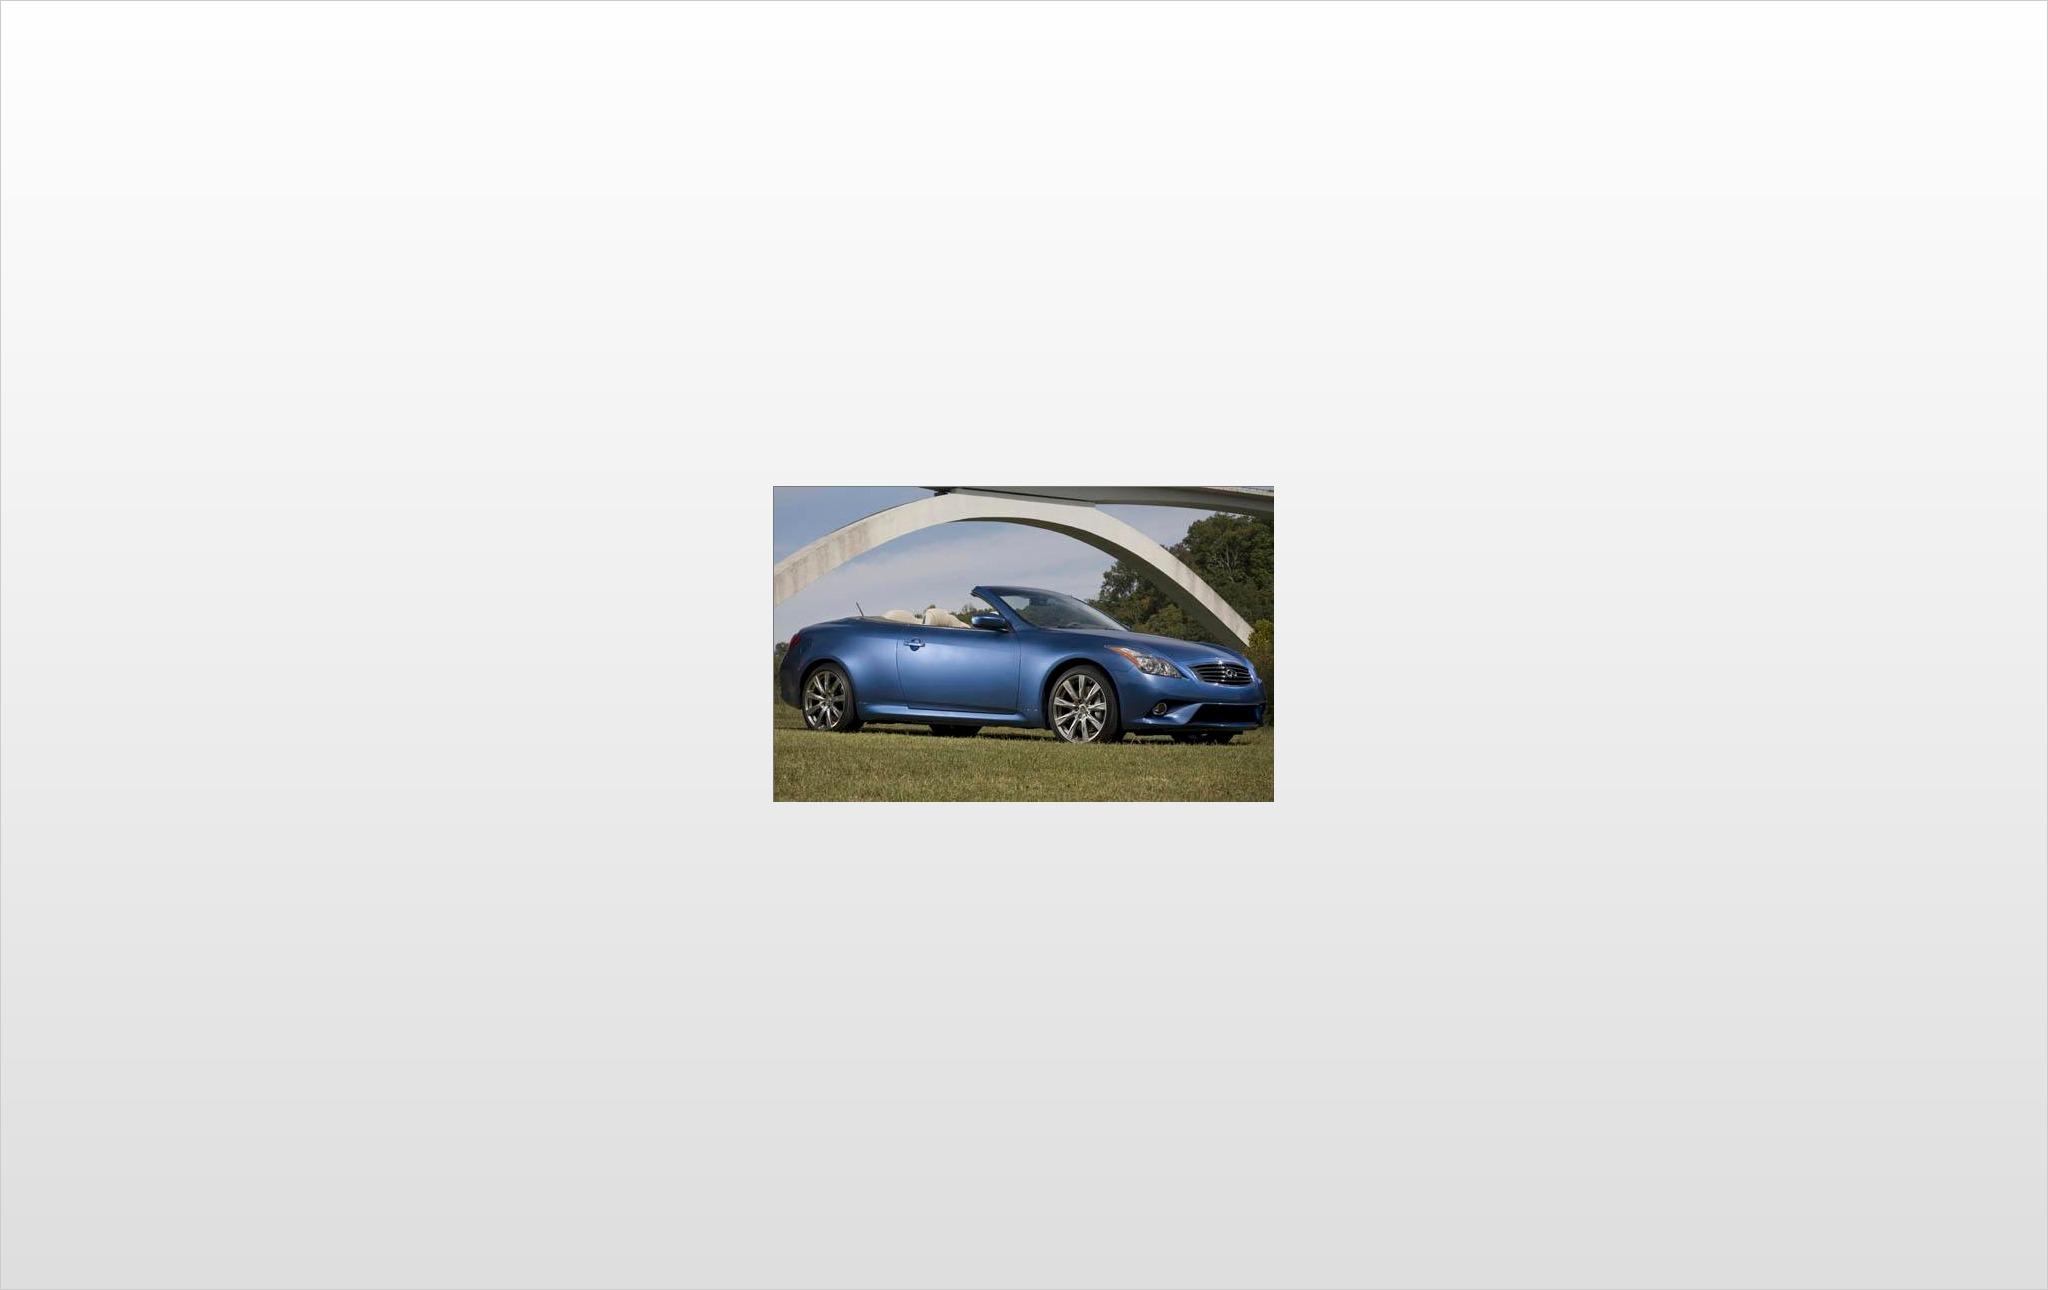 2012 infiniti g convertible convertible g37 sport fq oem 1 2048